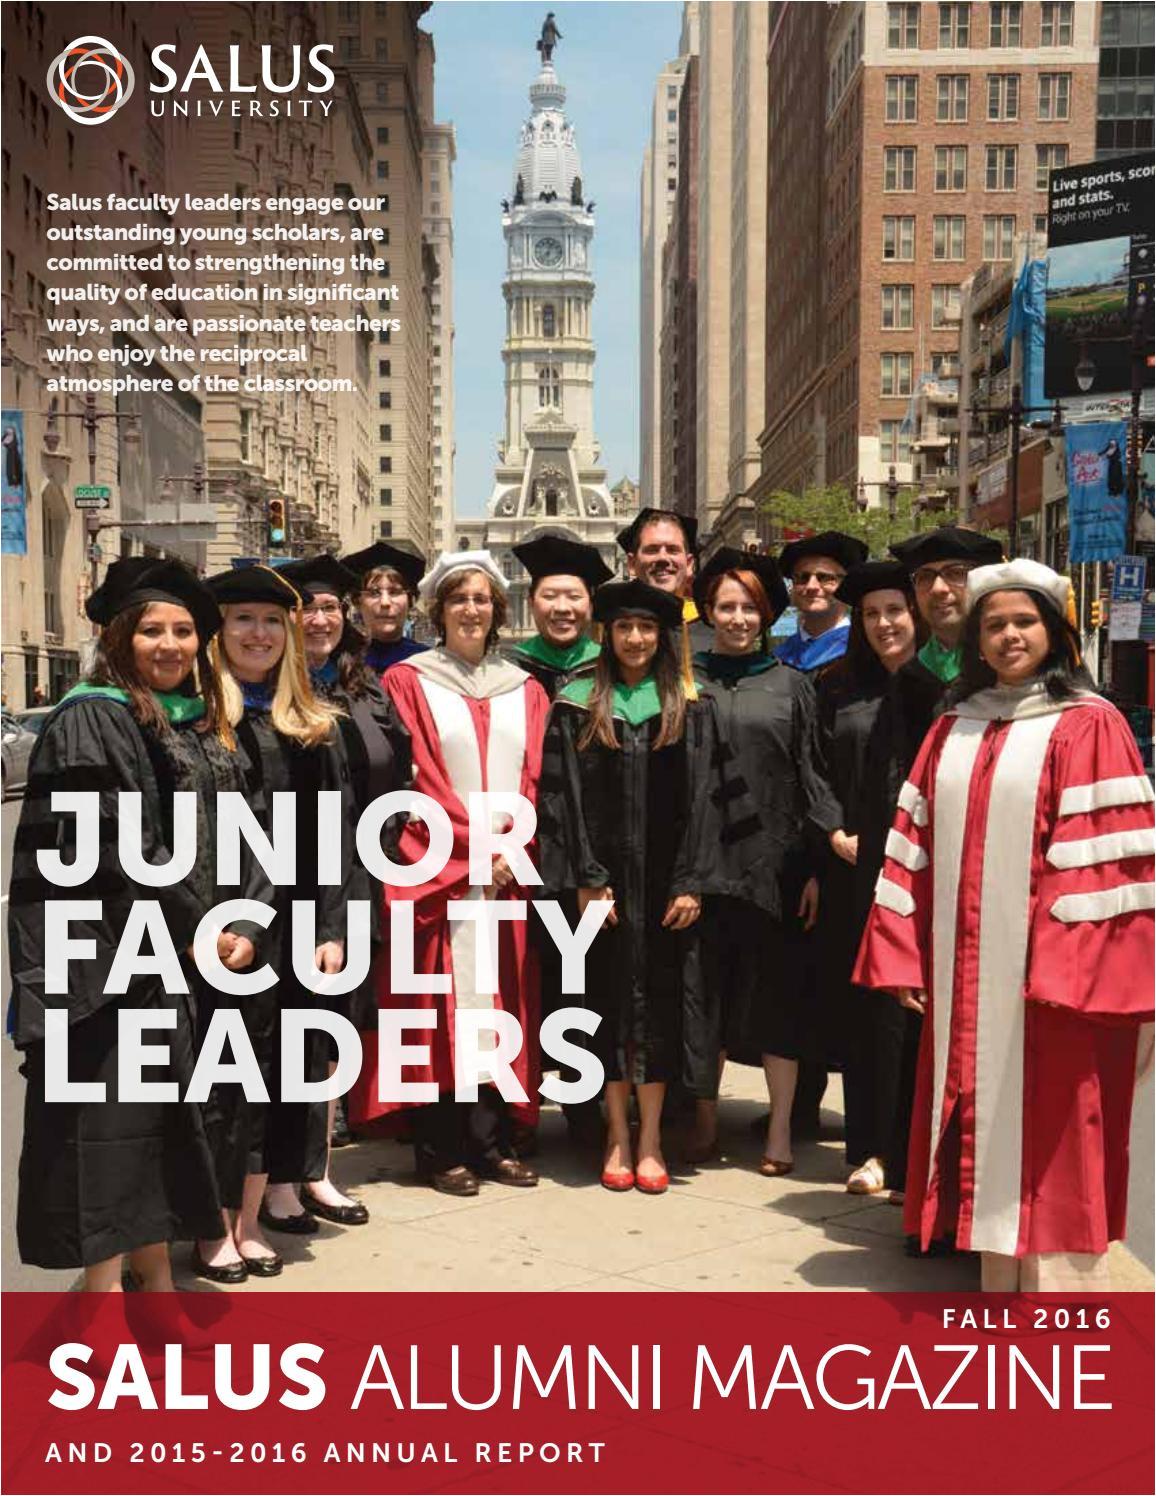 salus alumni magazine annual report fall 2016 by salus university issuu